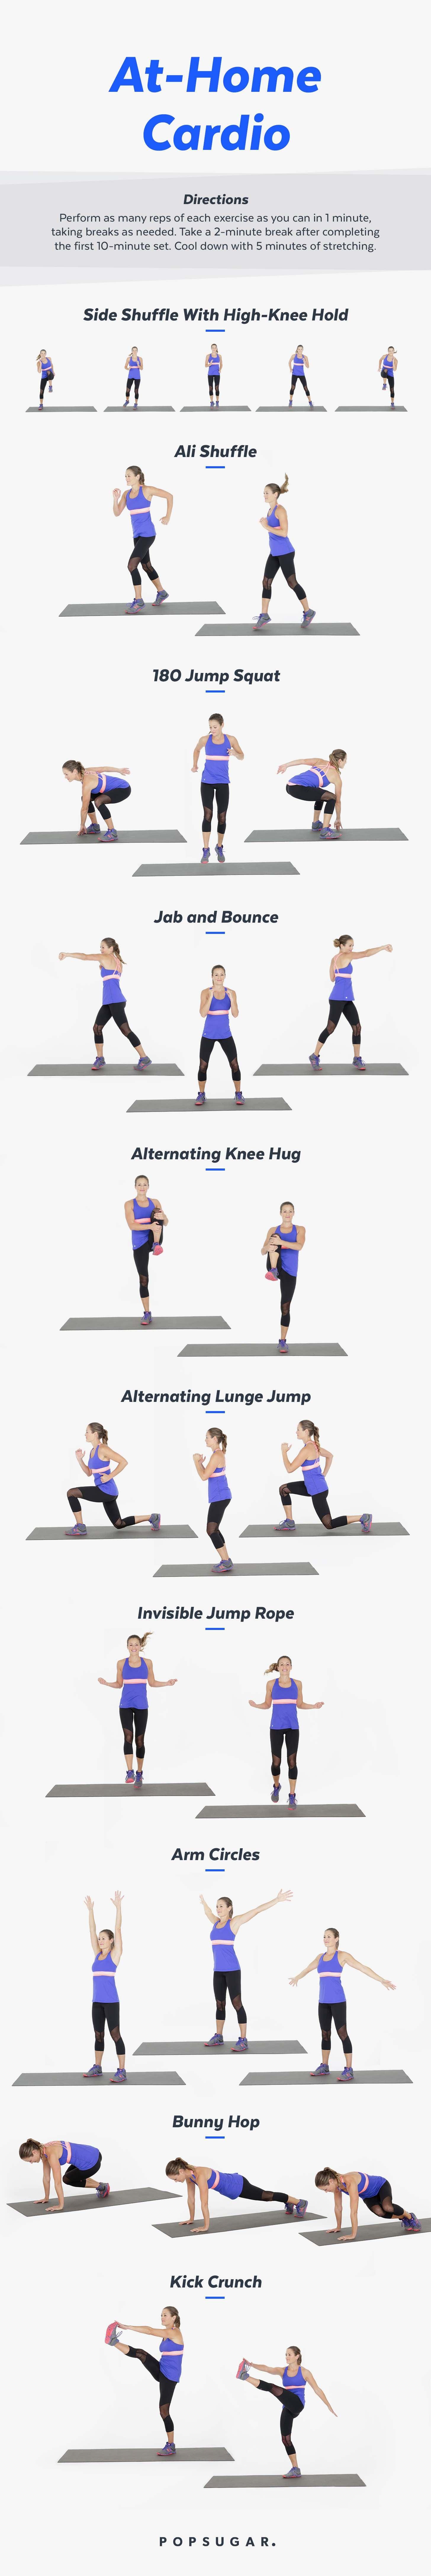 No-Run Cardio Workout | Video | POPSUGAR Fitness